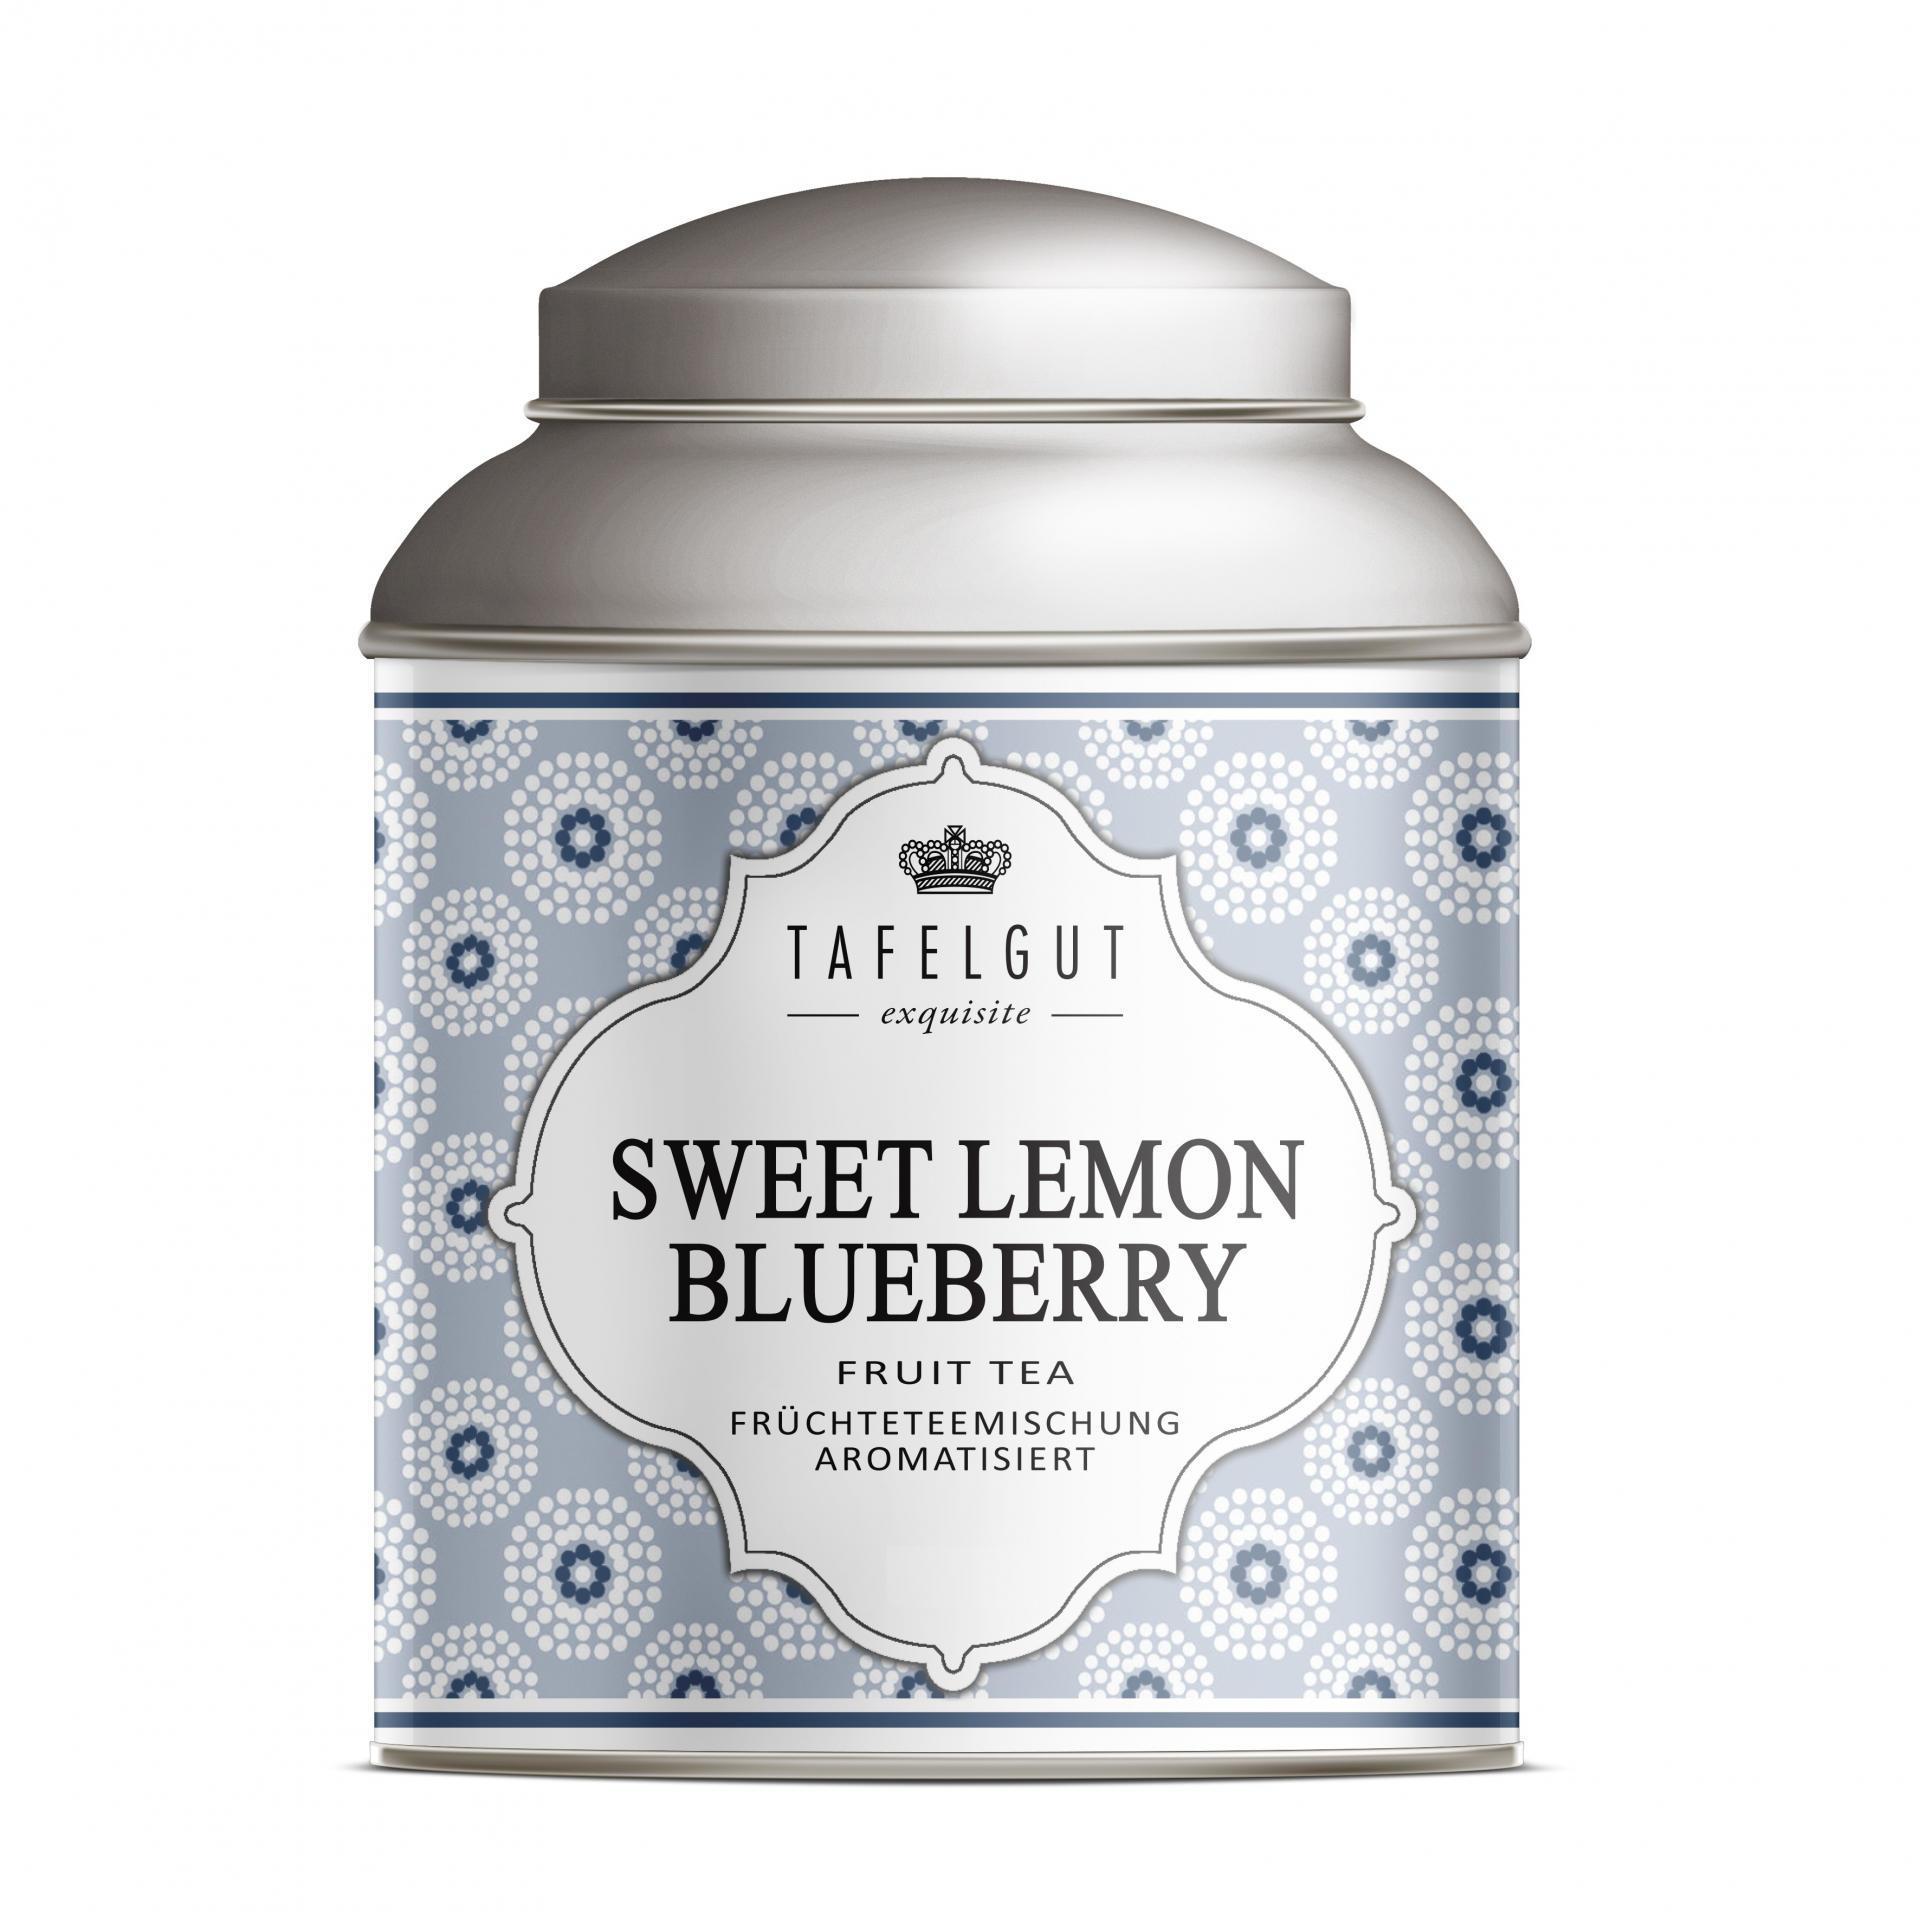 TAFELGUT Mini ovocný čaj Sweet Lemon Blueberry - 40gr, modrá barva, kov